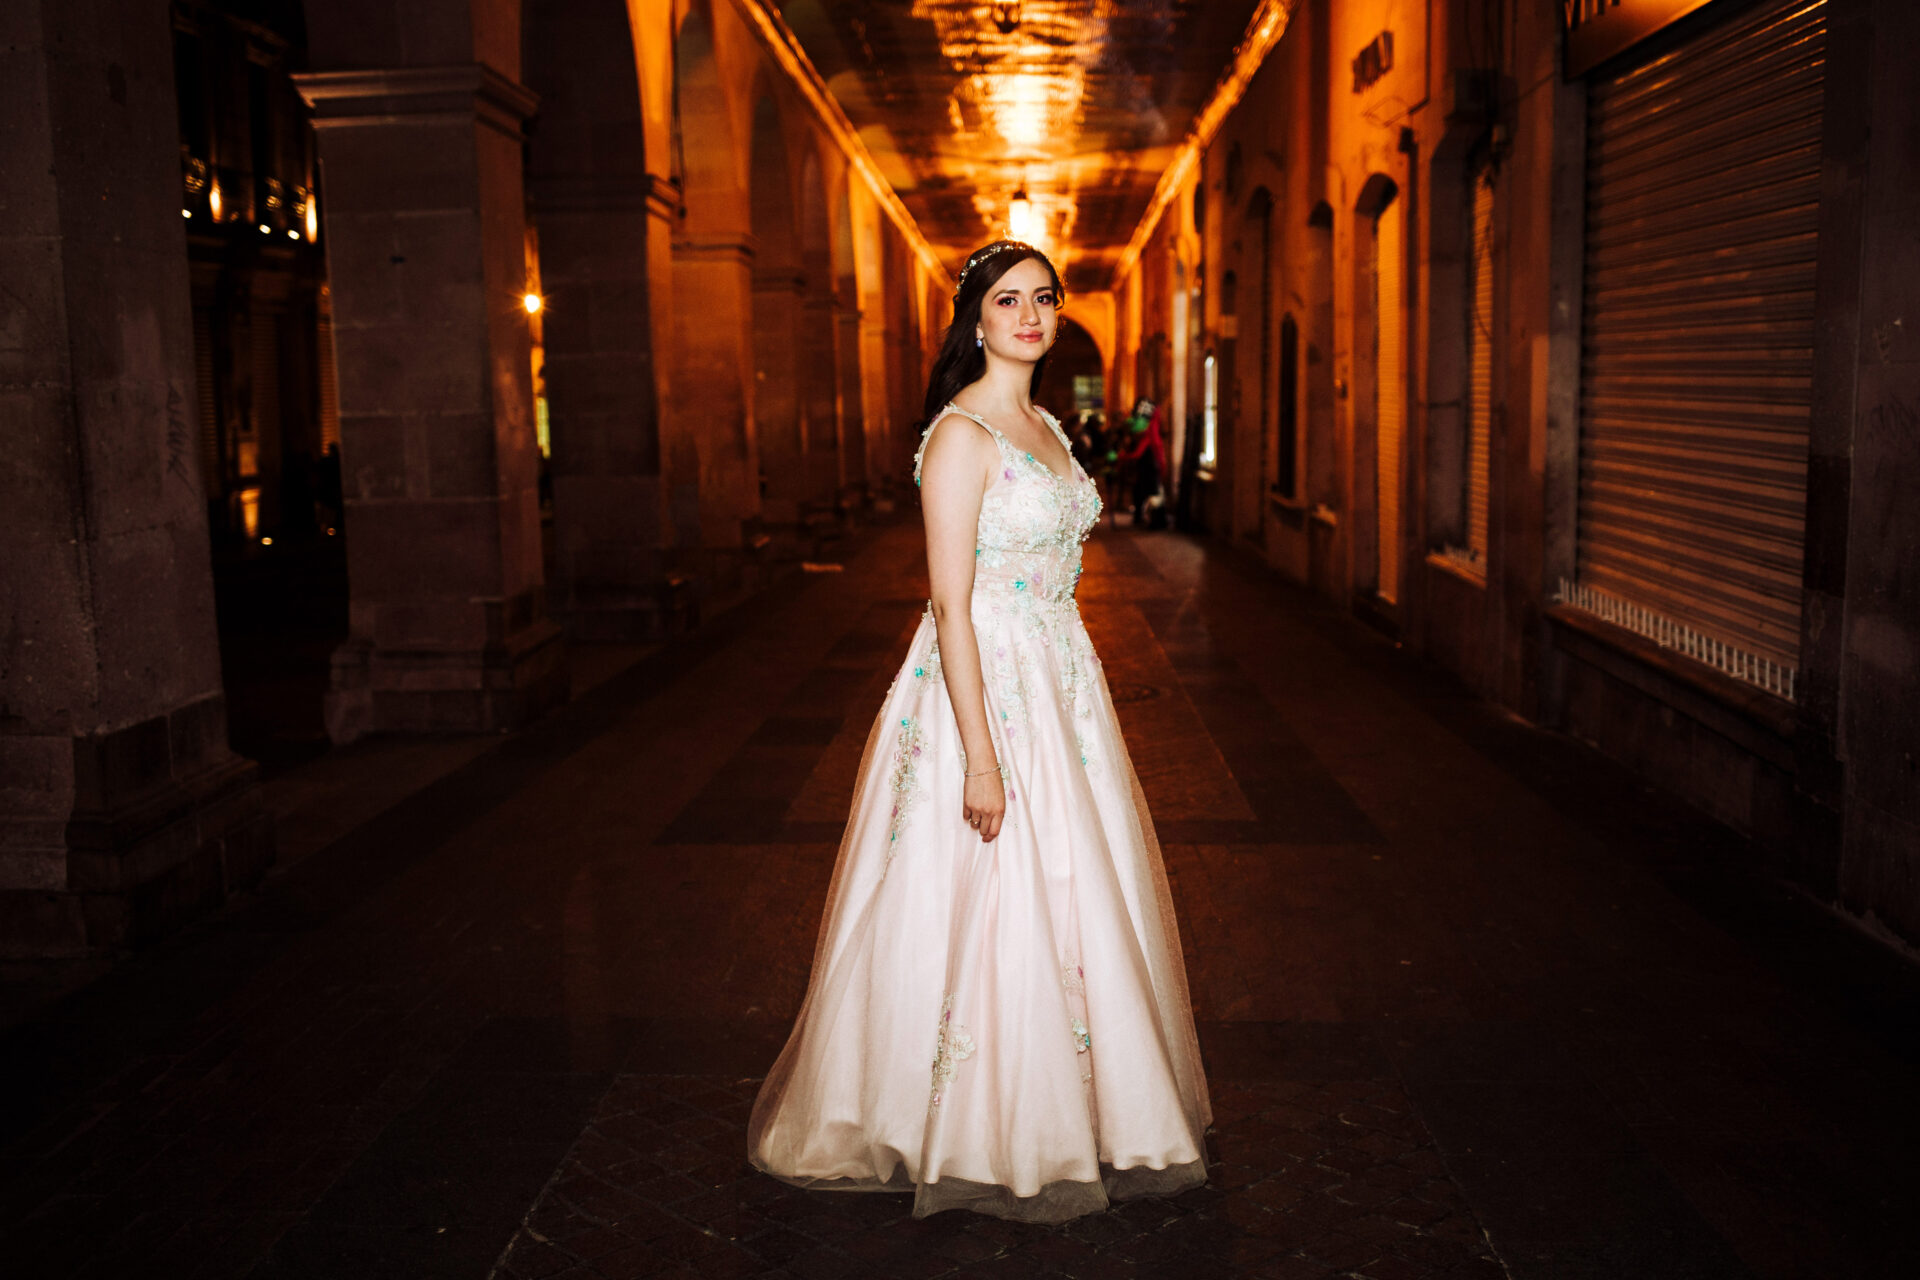 javier_noriega_fotografo_bodas_zacatecas_trash_the_dress_xv_años00006